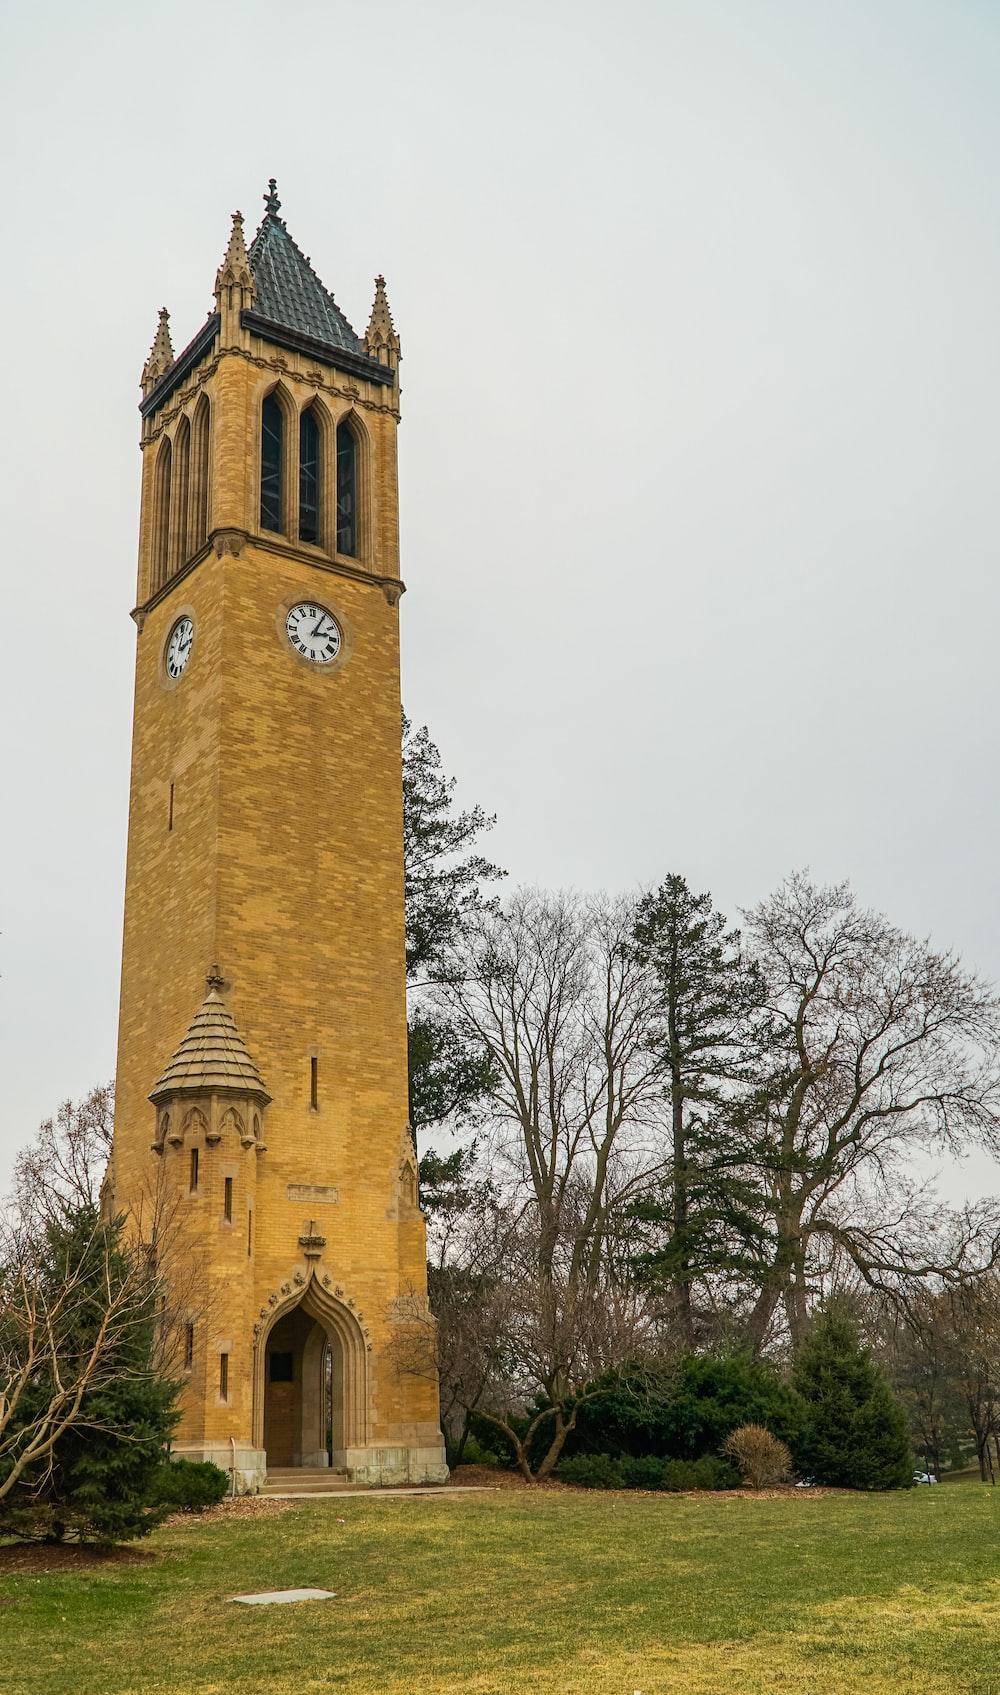 brown concrete tower clock